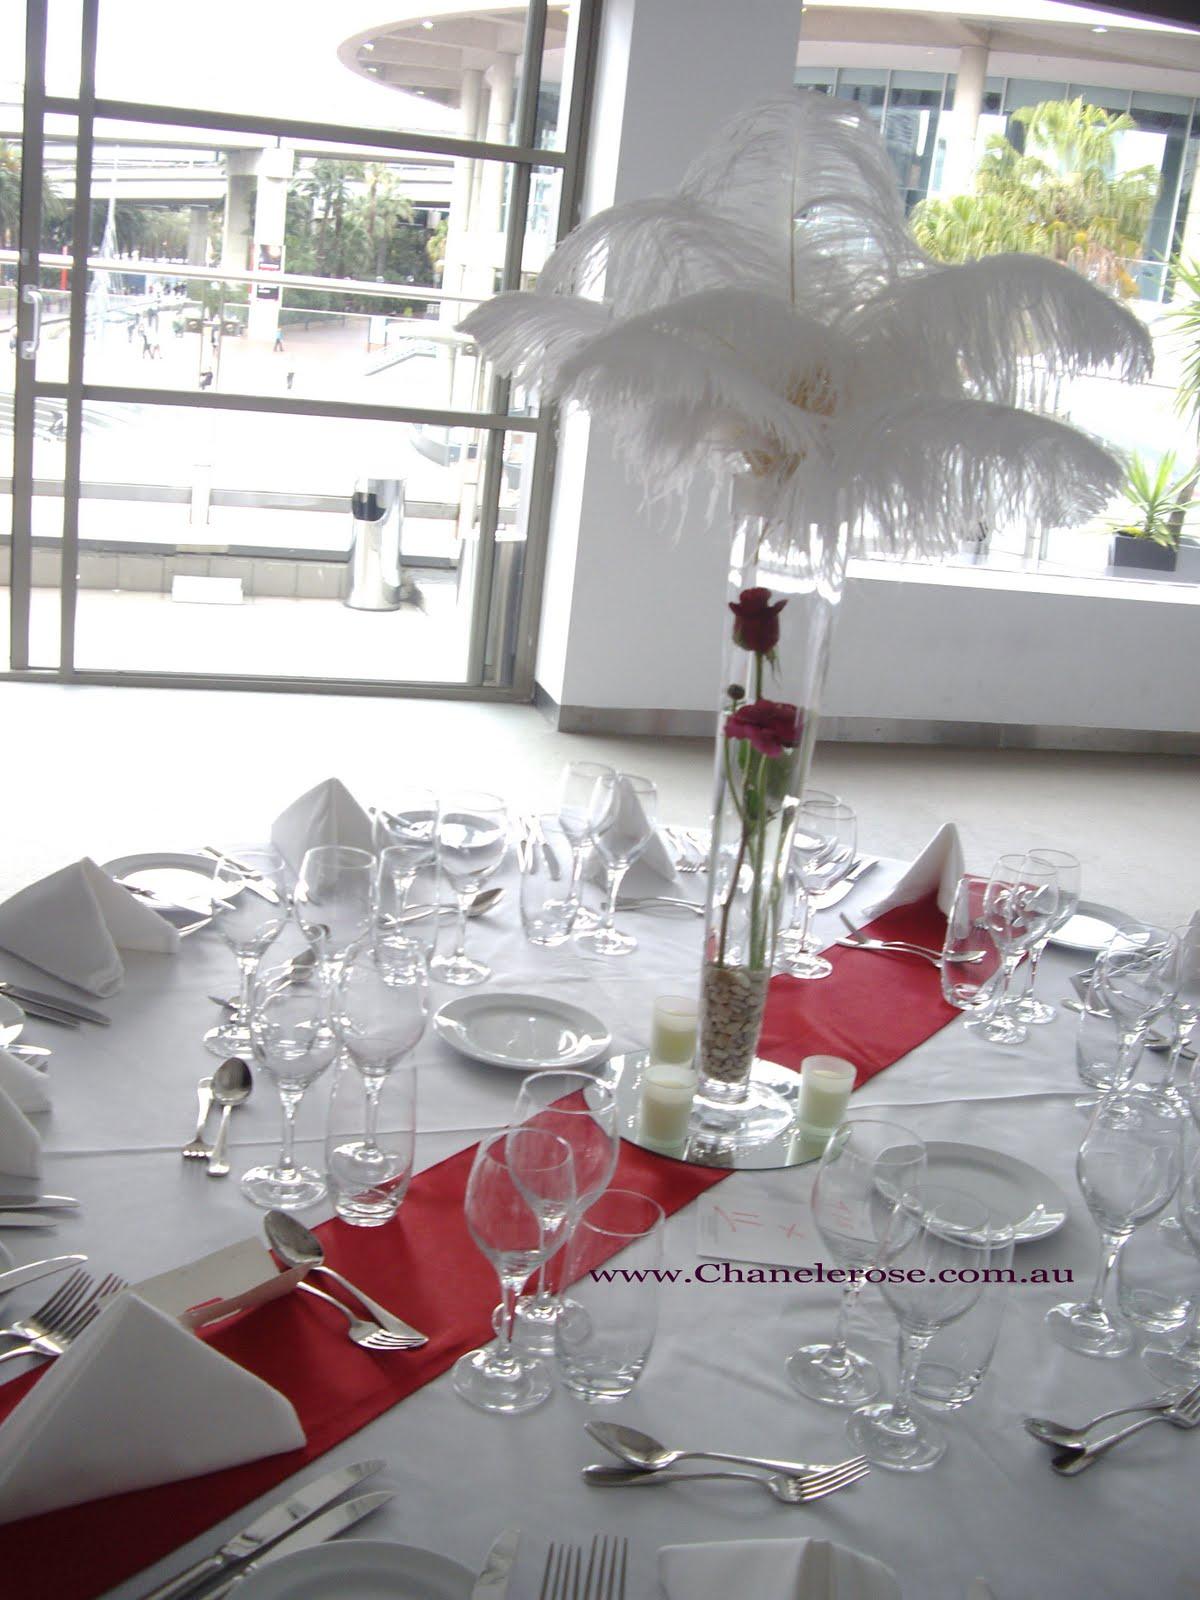 Chanele Rose Flowers Blog- Sydney Wedding stylist & Florist: A ...